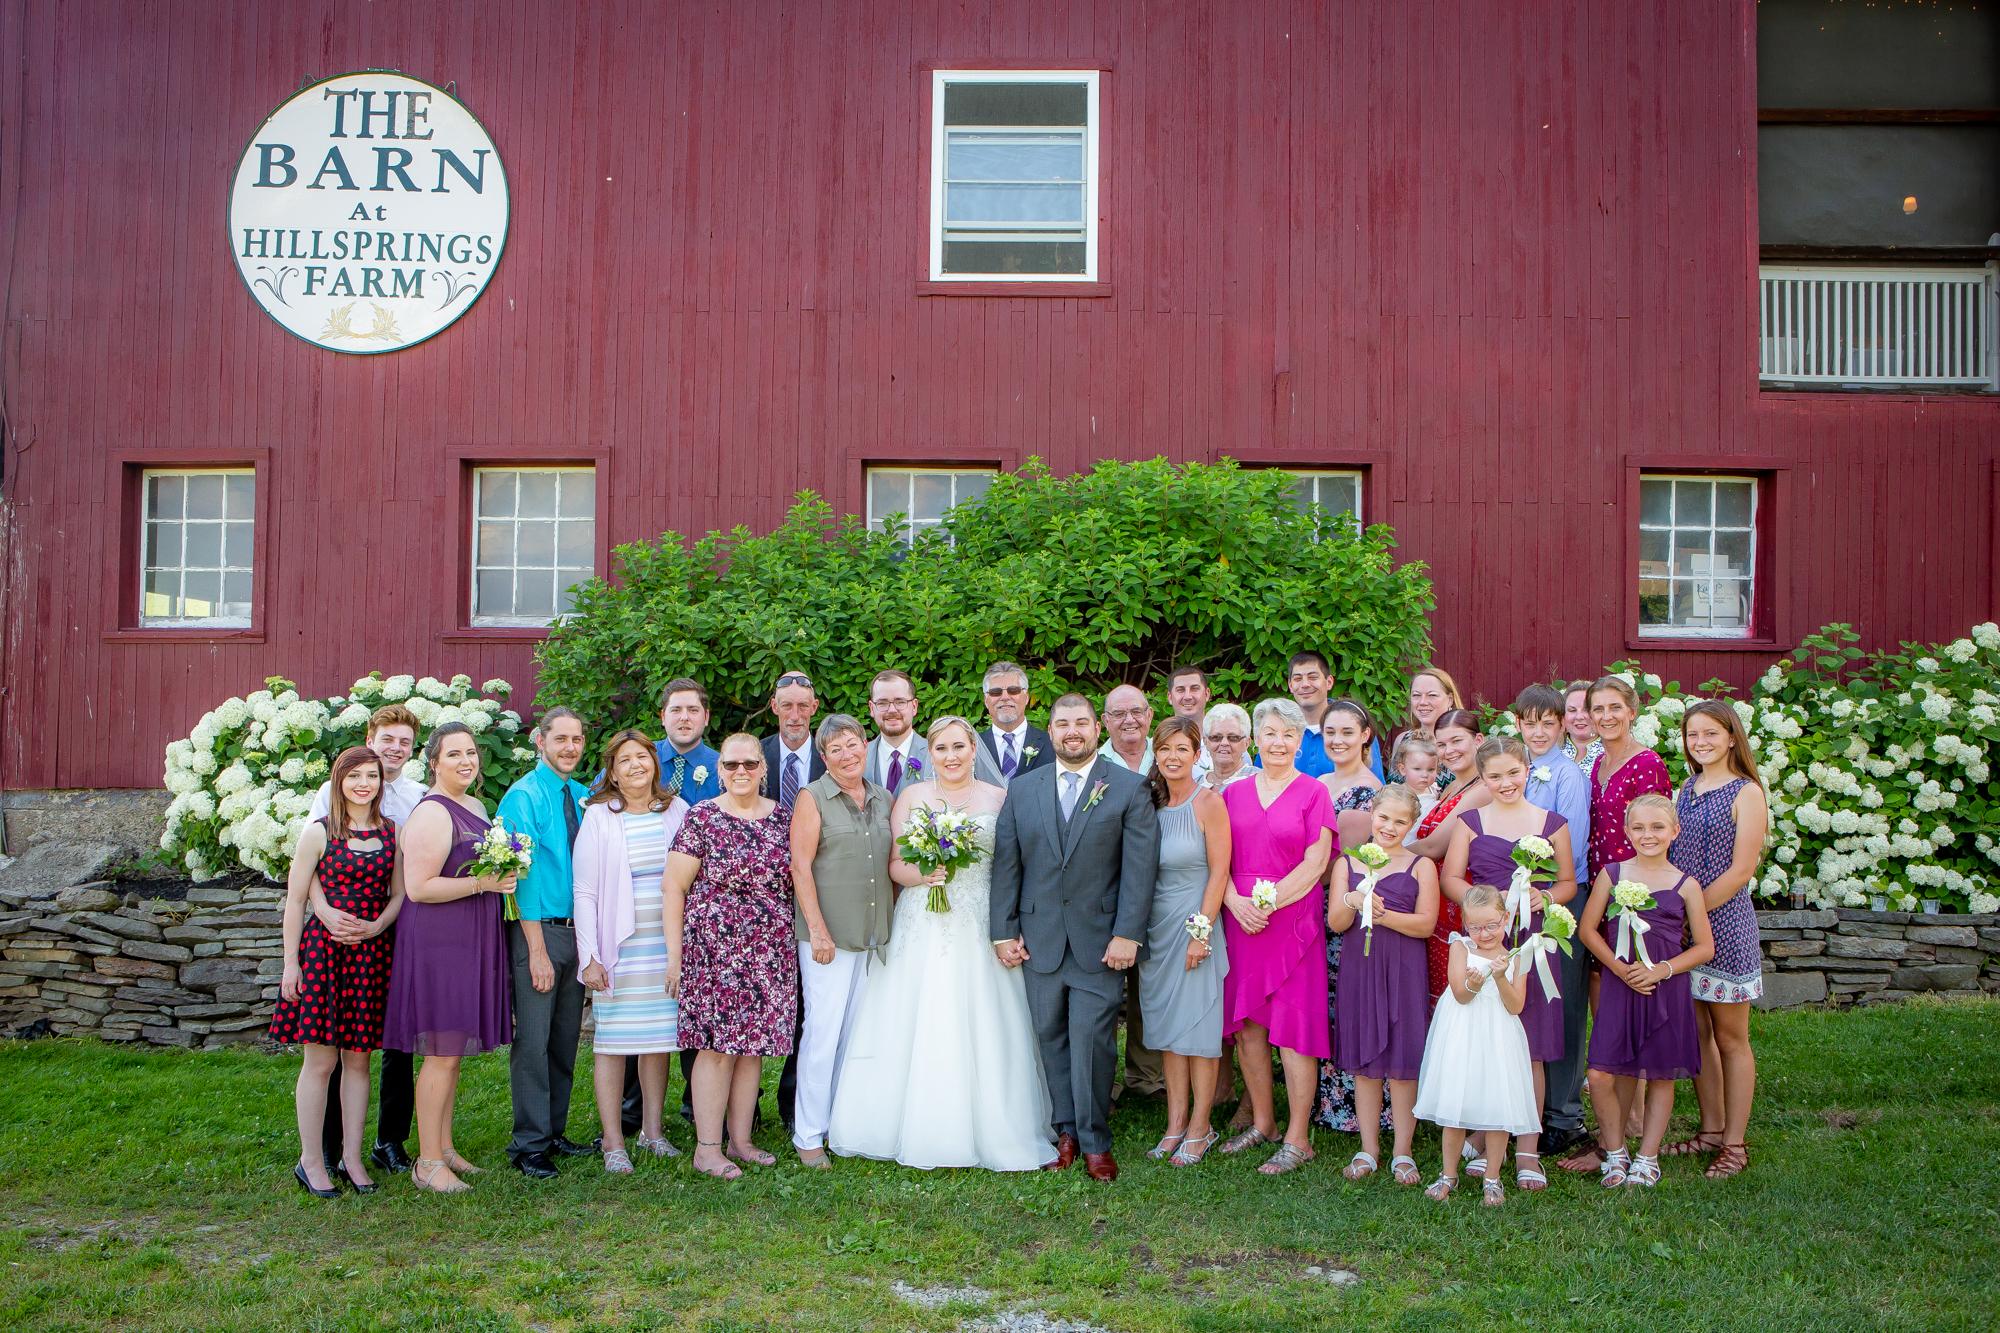 The Barn at Hillsprings Farm in Addison, NY